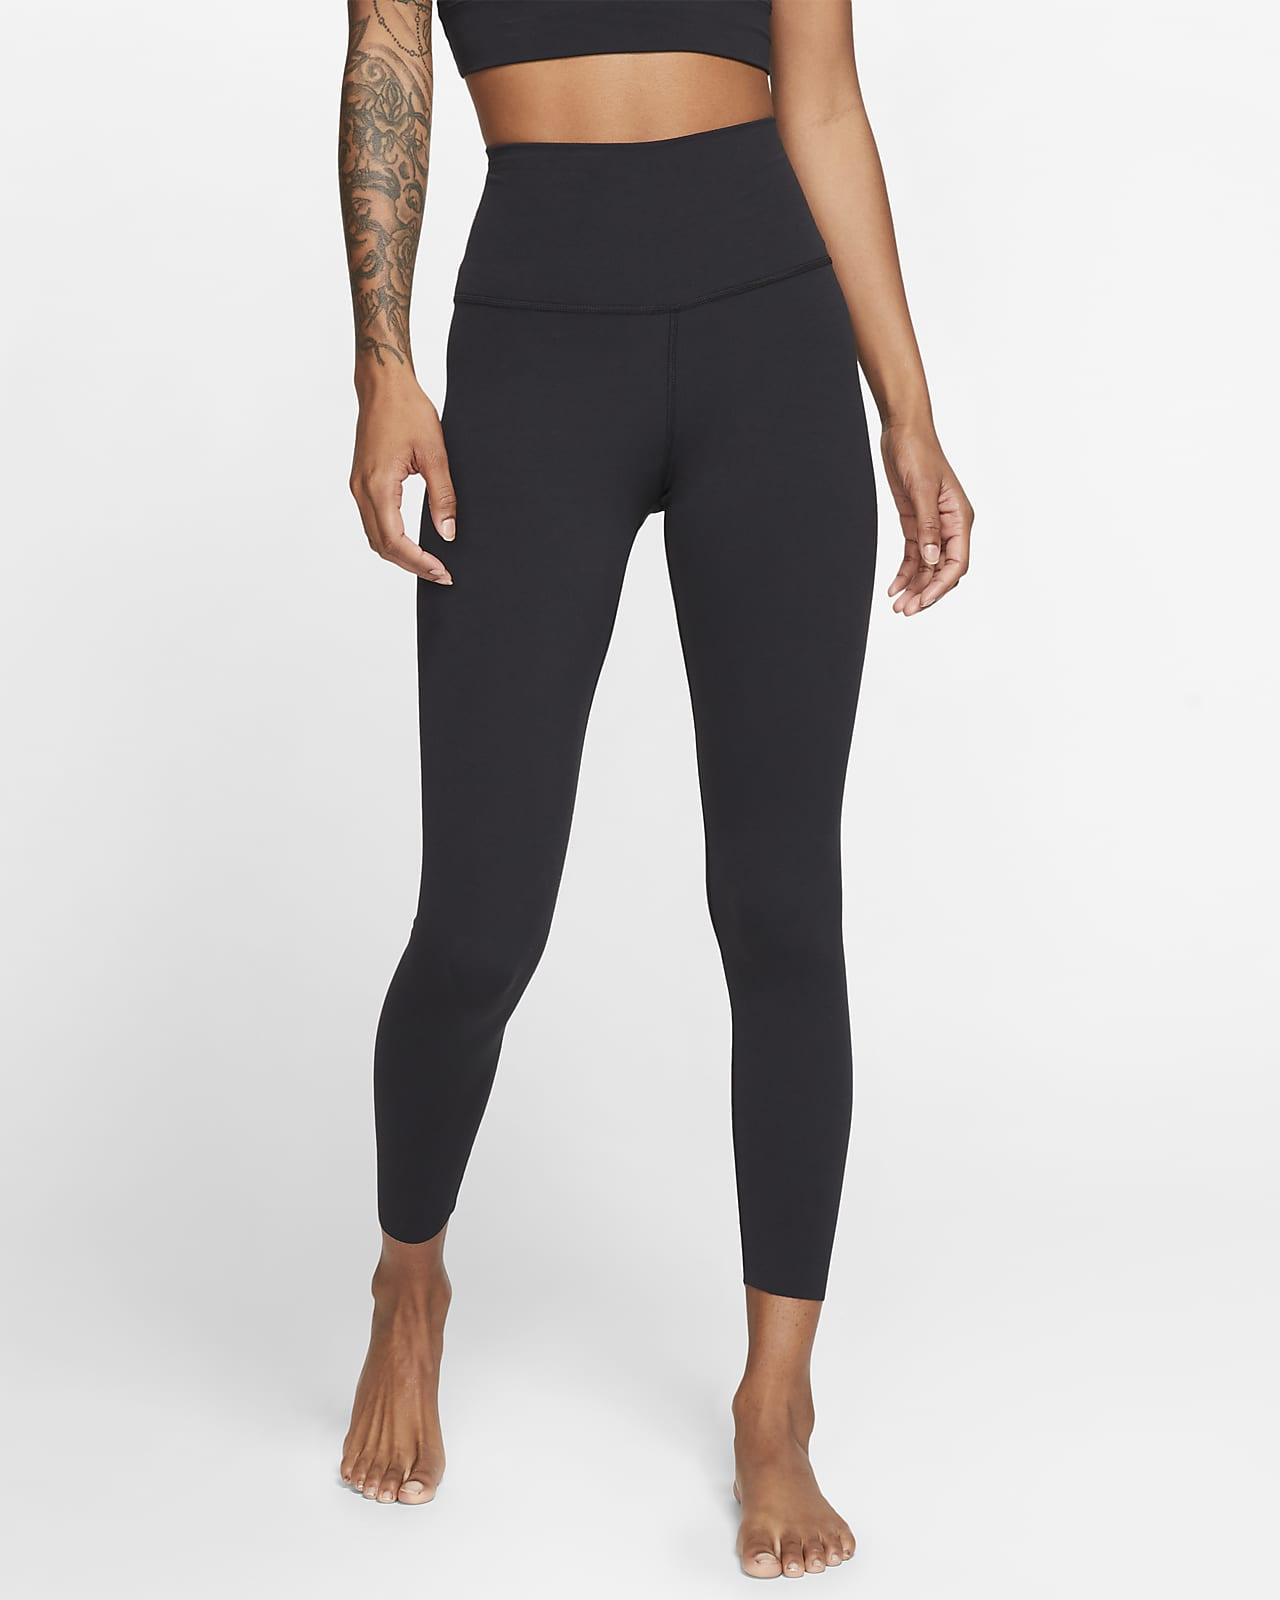 Nike Yoga Luxe Leggings de 7/8 de teixit Infinalon amb cintura alta - Dona